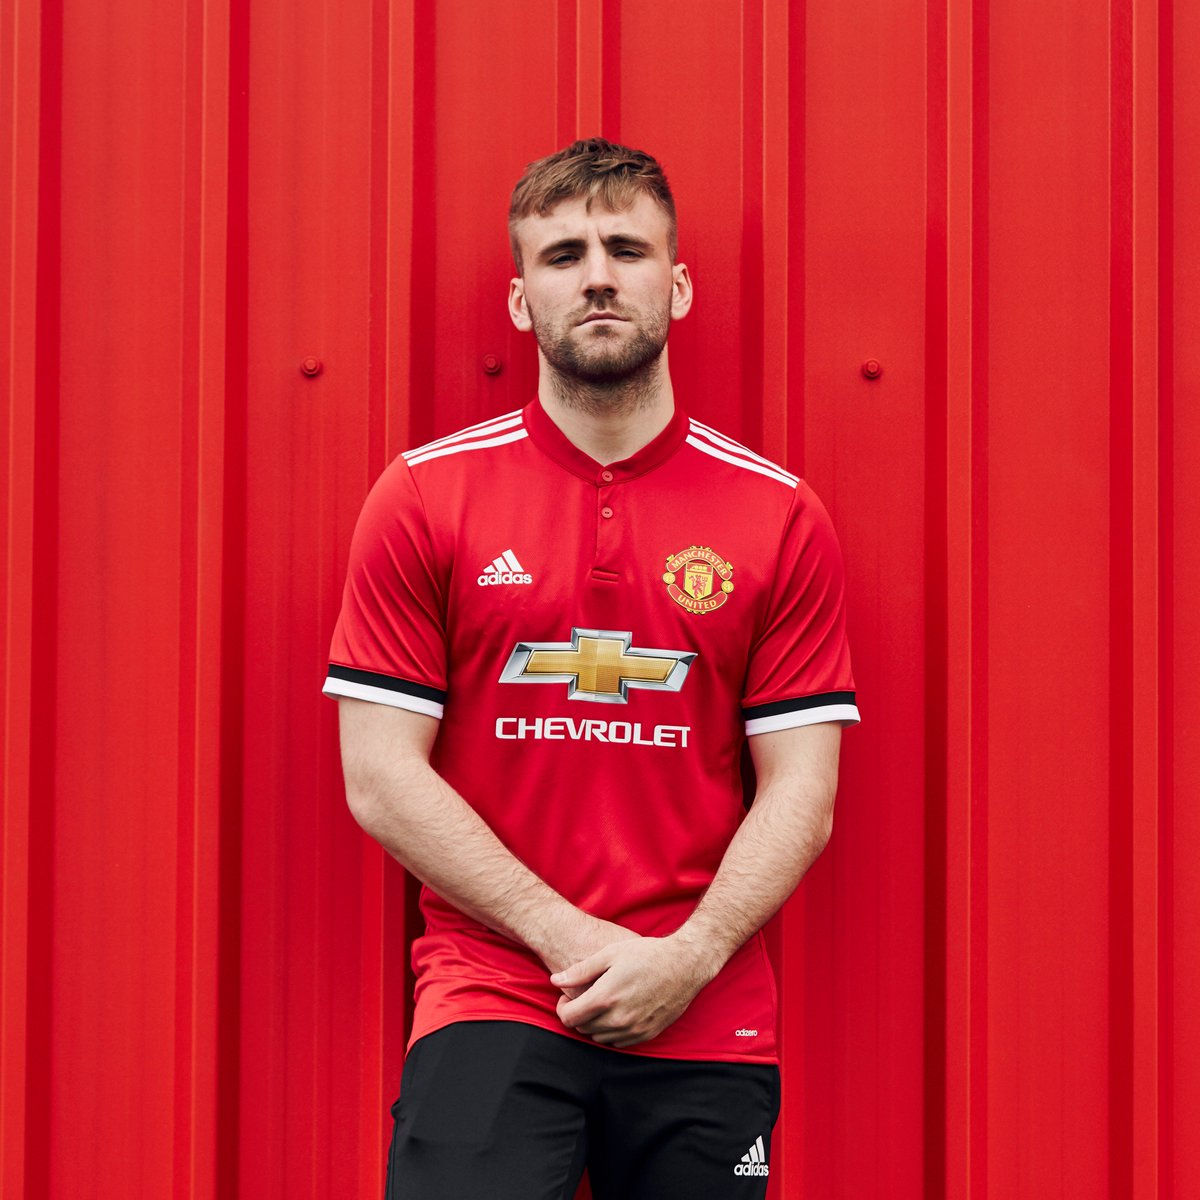 b48fd63f Manchester United on Twitter: